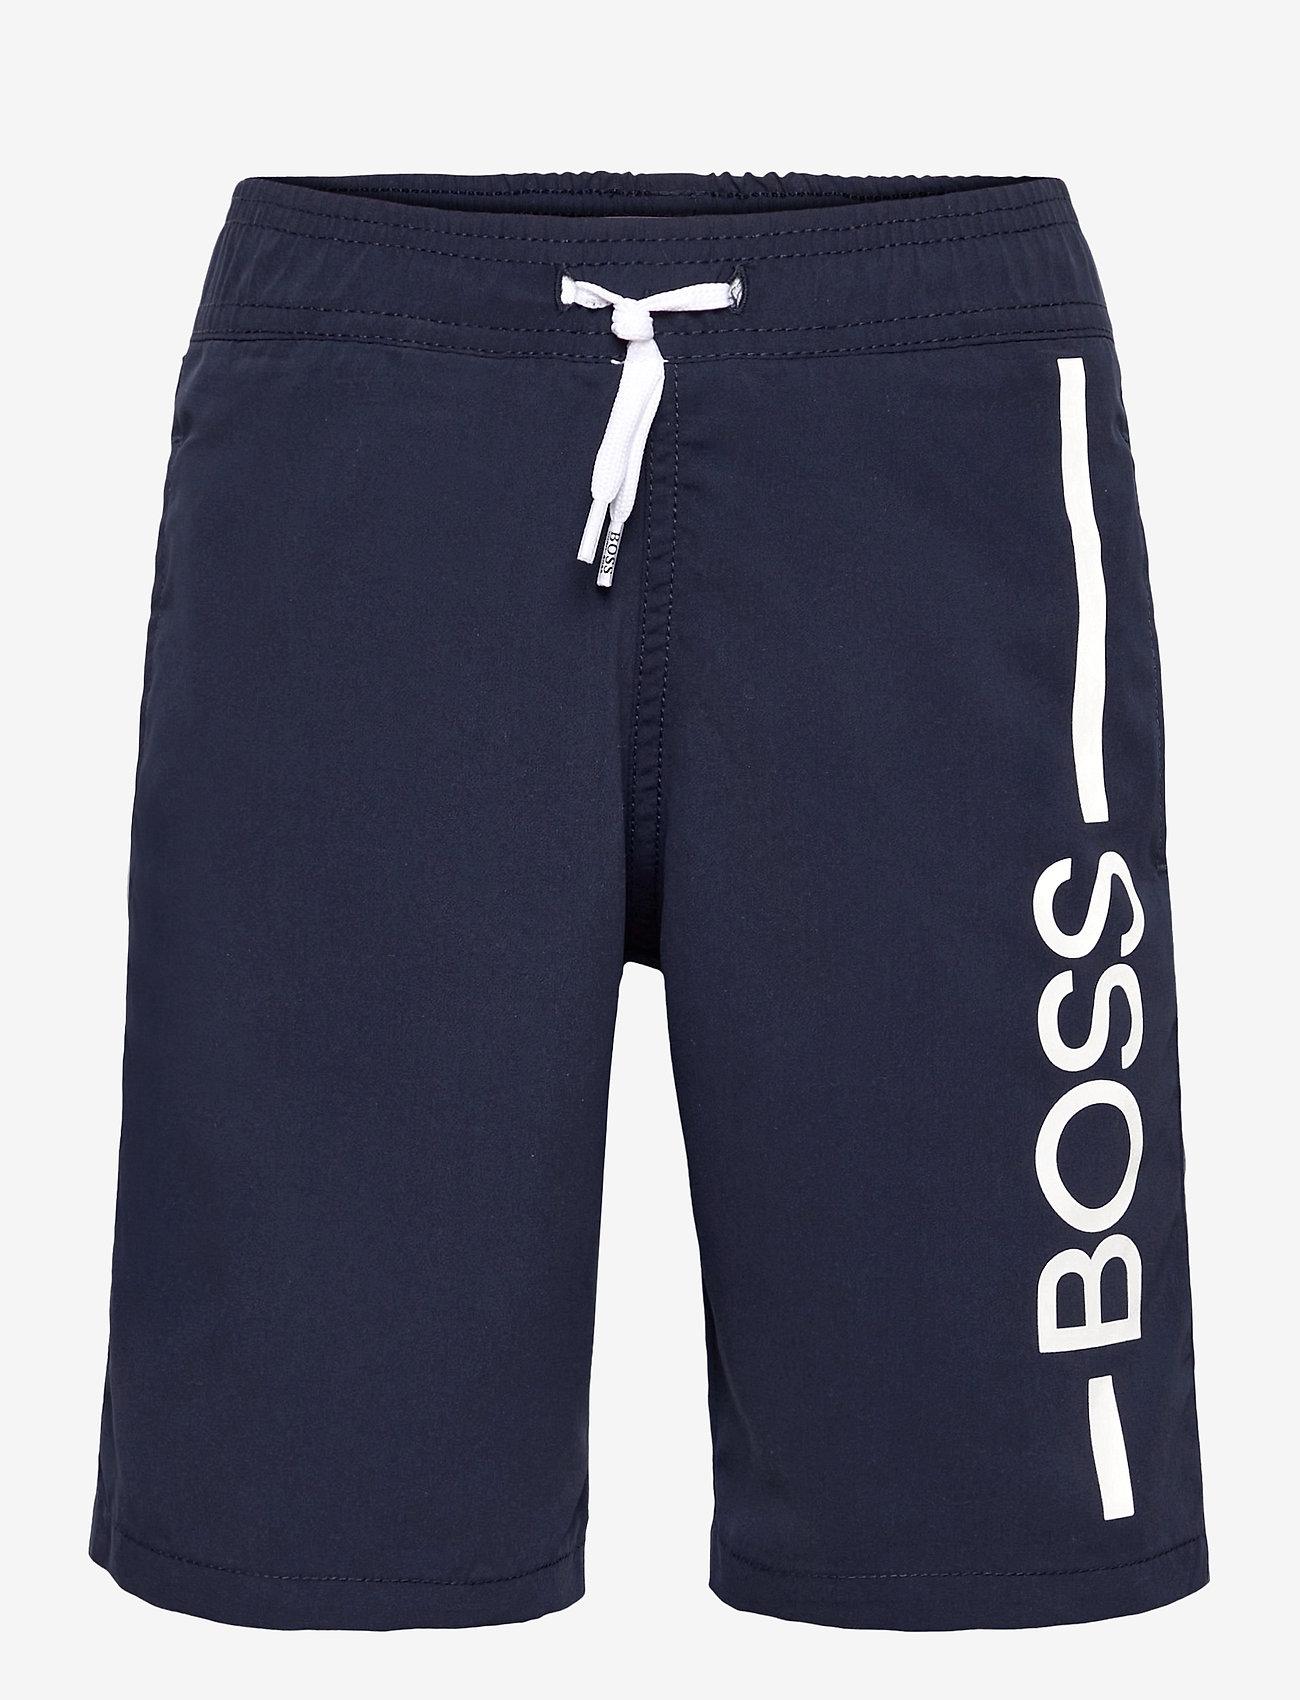 BOSS - SWIM SHORTS - badehosen - navy - 0